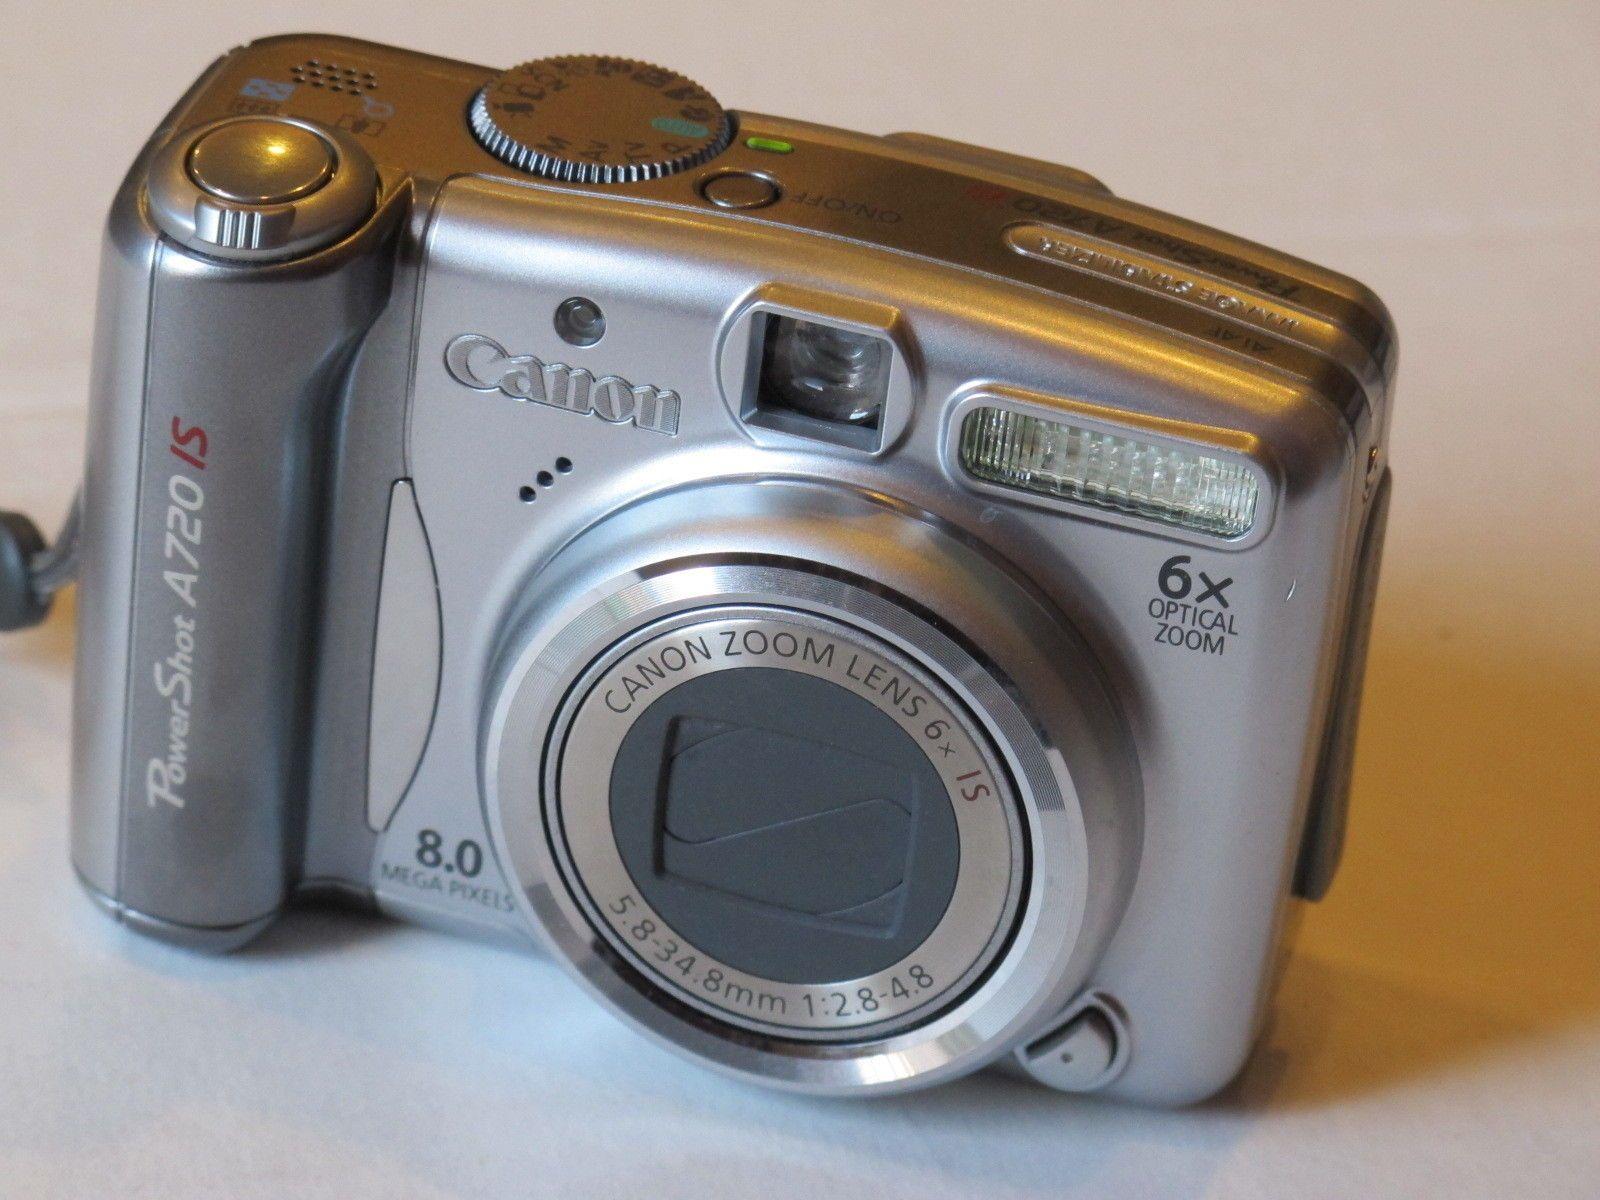 Canon Powershot A720 Is 8 0 Megapixel Digital Camera Silver With 2gb Mem Card Digital Camera Powershot Canon Powershot